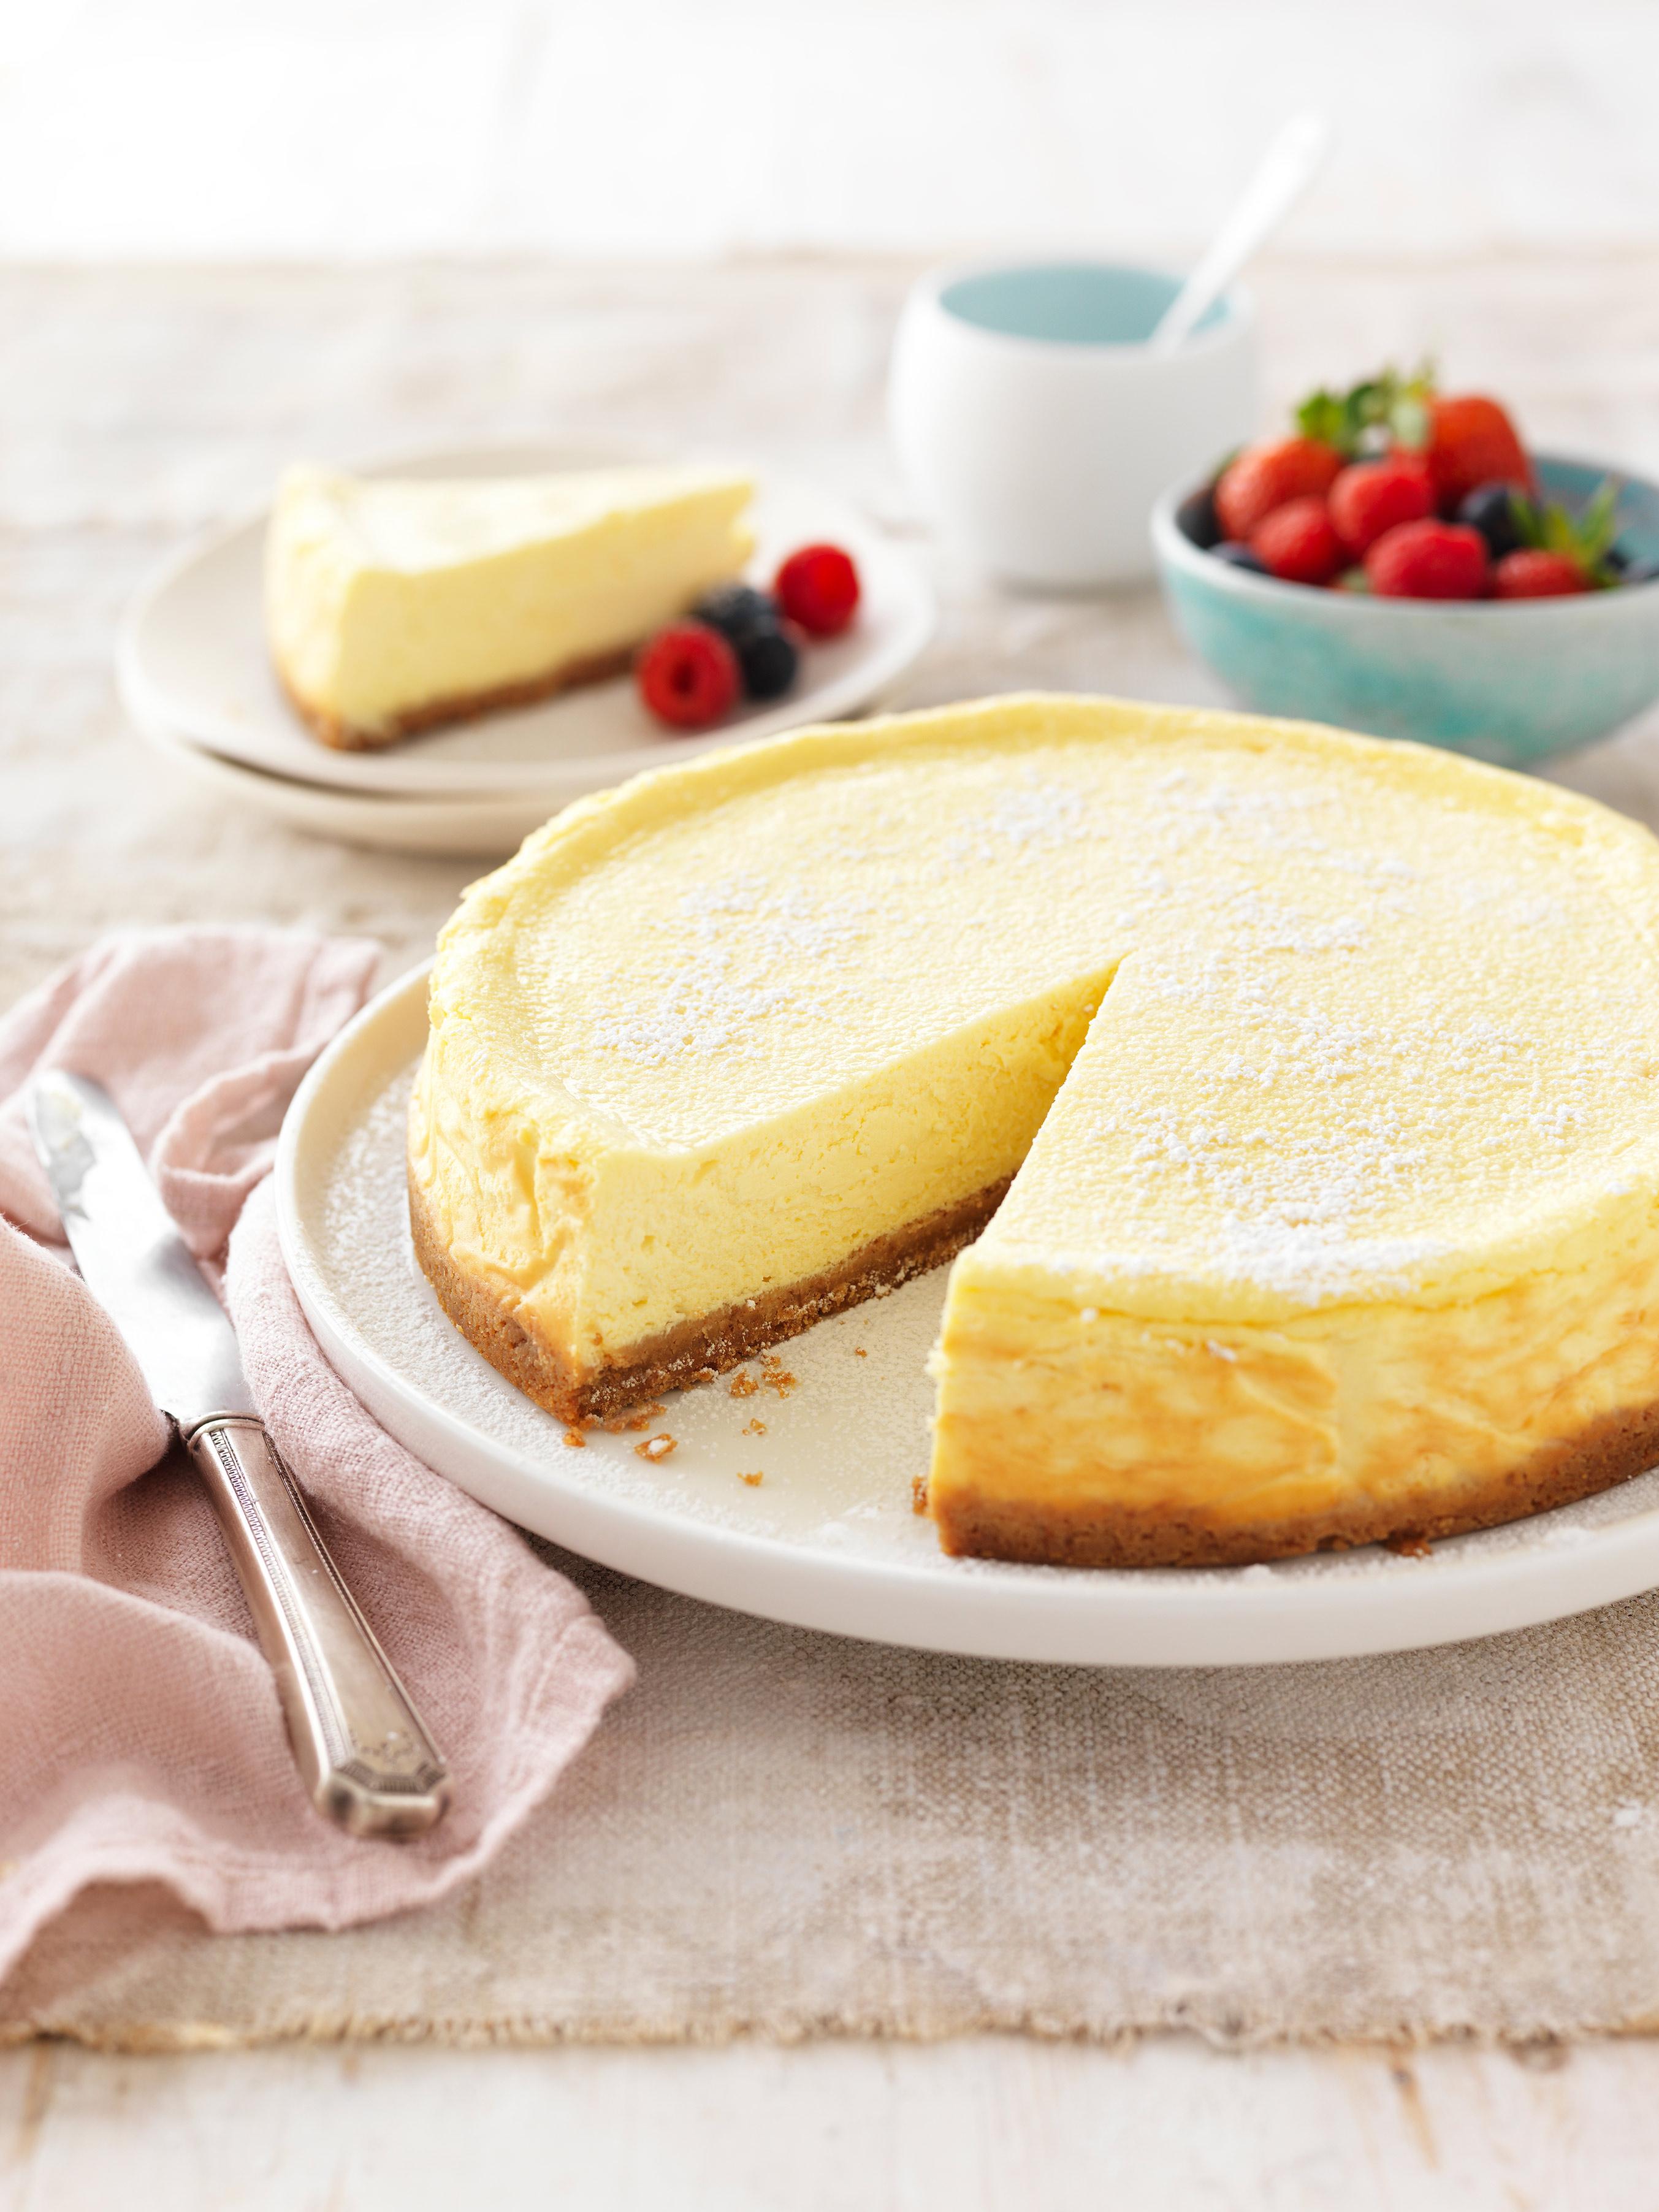 Best Baked Cheesecake recipe